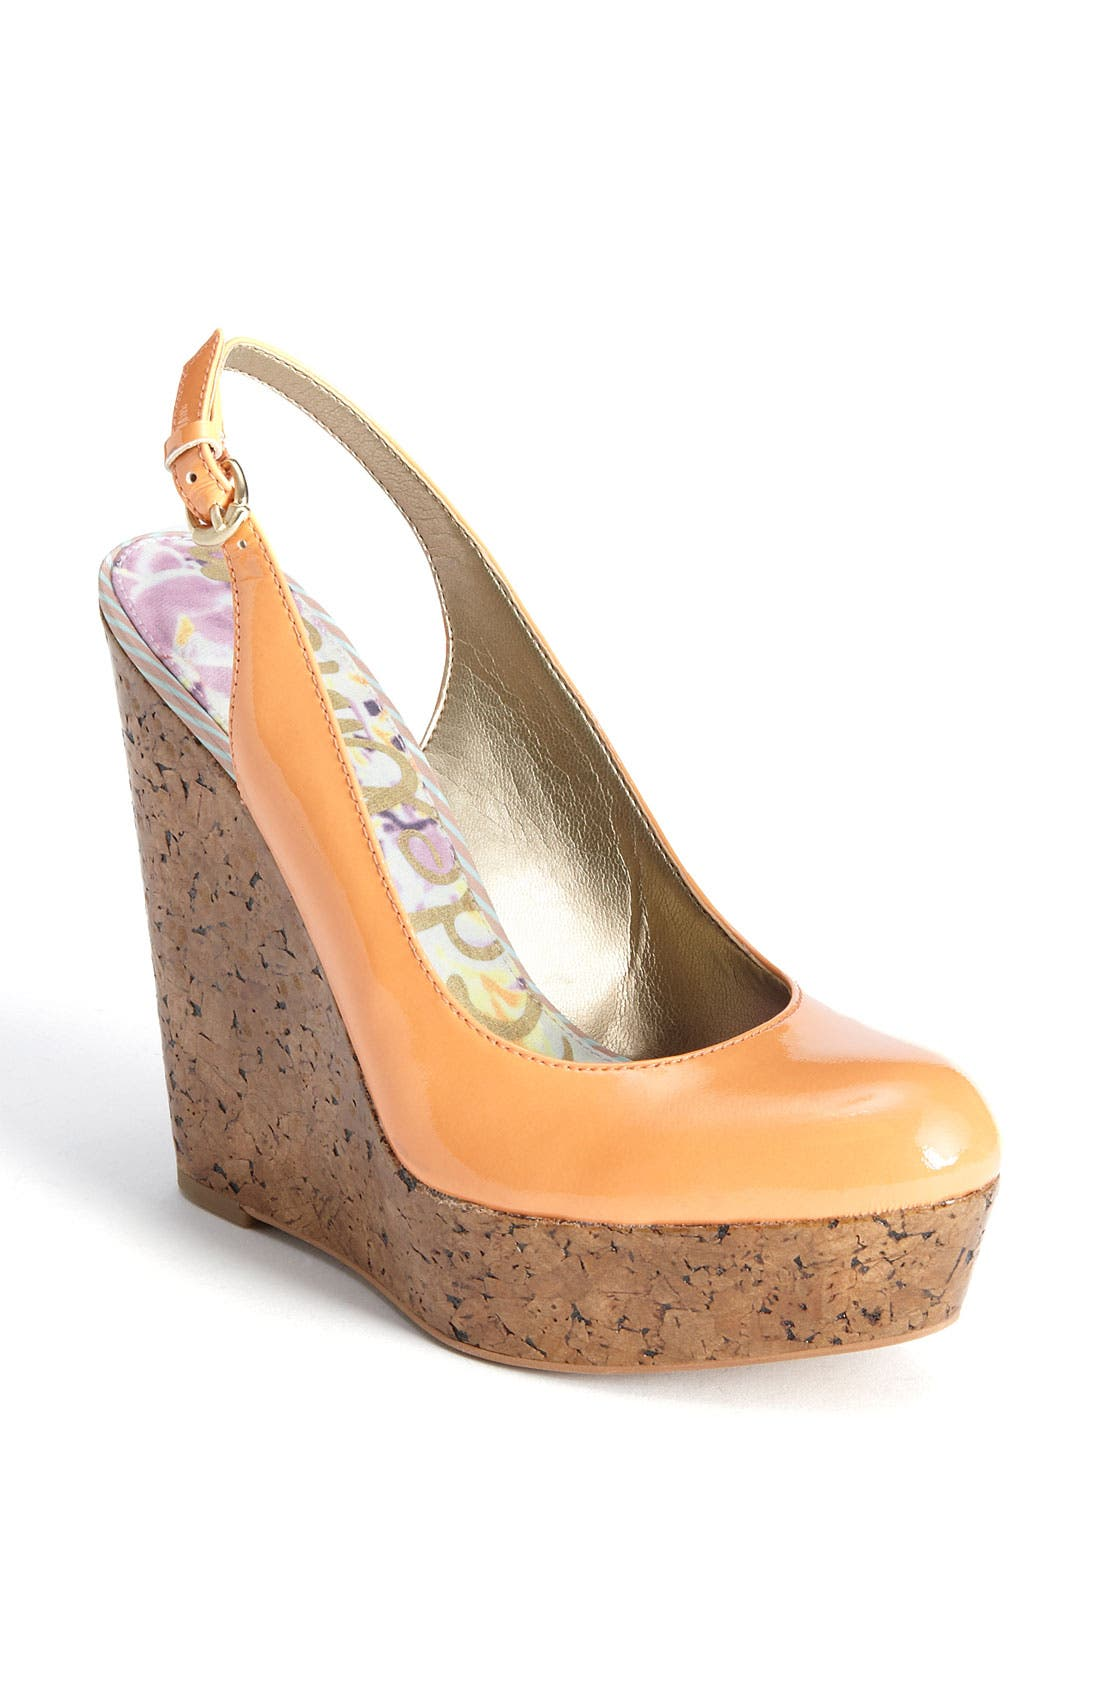 Main Image - Sam Edelman 'Mallory' Sandal